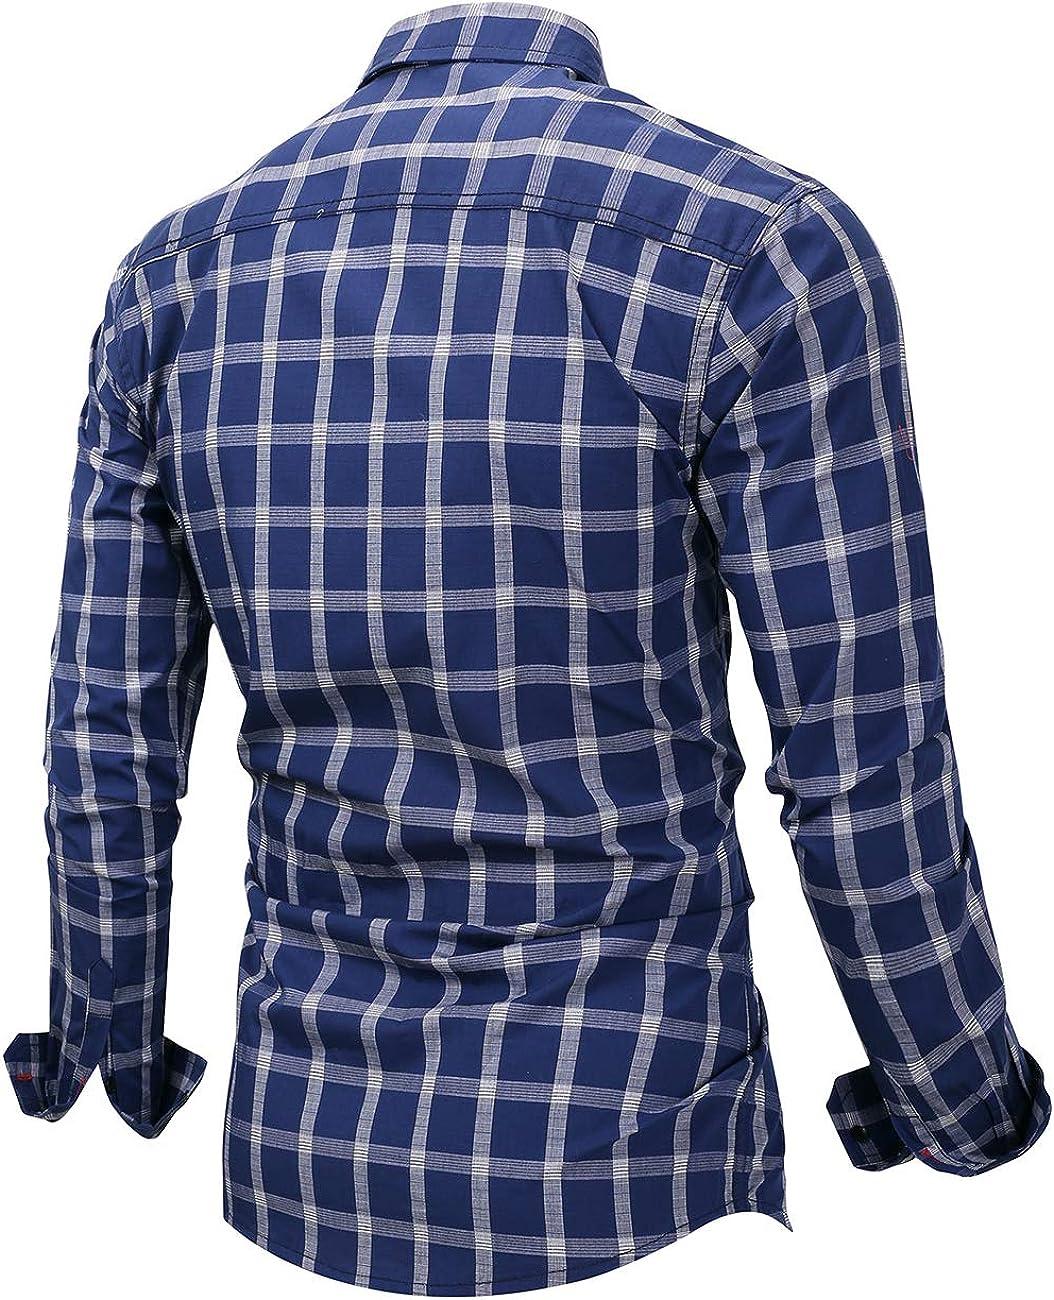 Pinkpum Mens Long Sleeve Checked Shirt Cotton Plaid Shirt Business Casual Dress British Stylish Classic Shirt Regular Fit T2-dark Blue